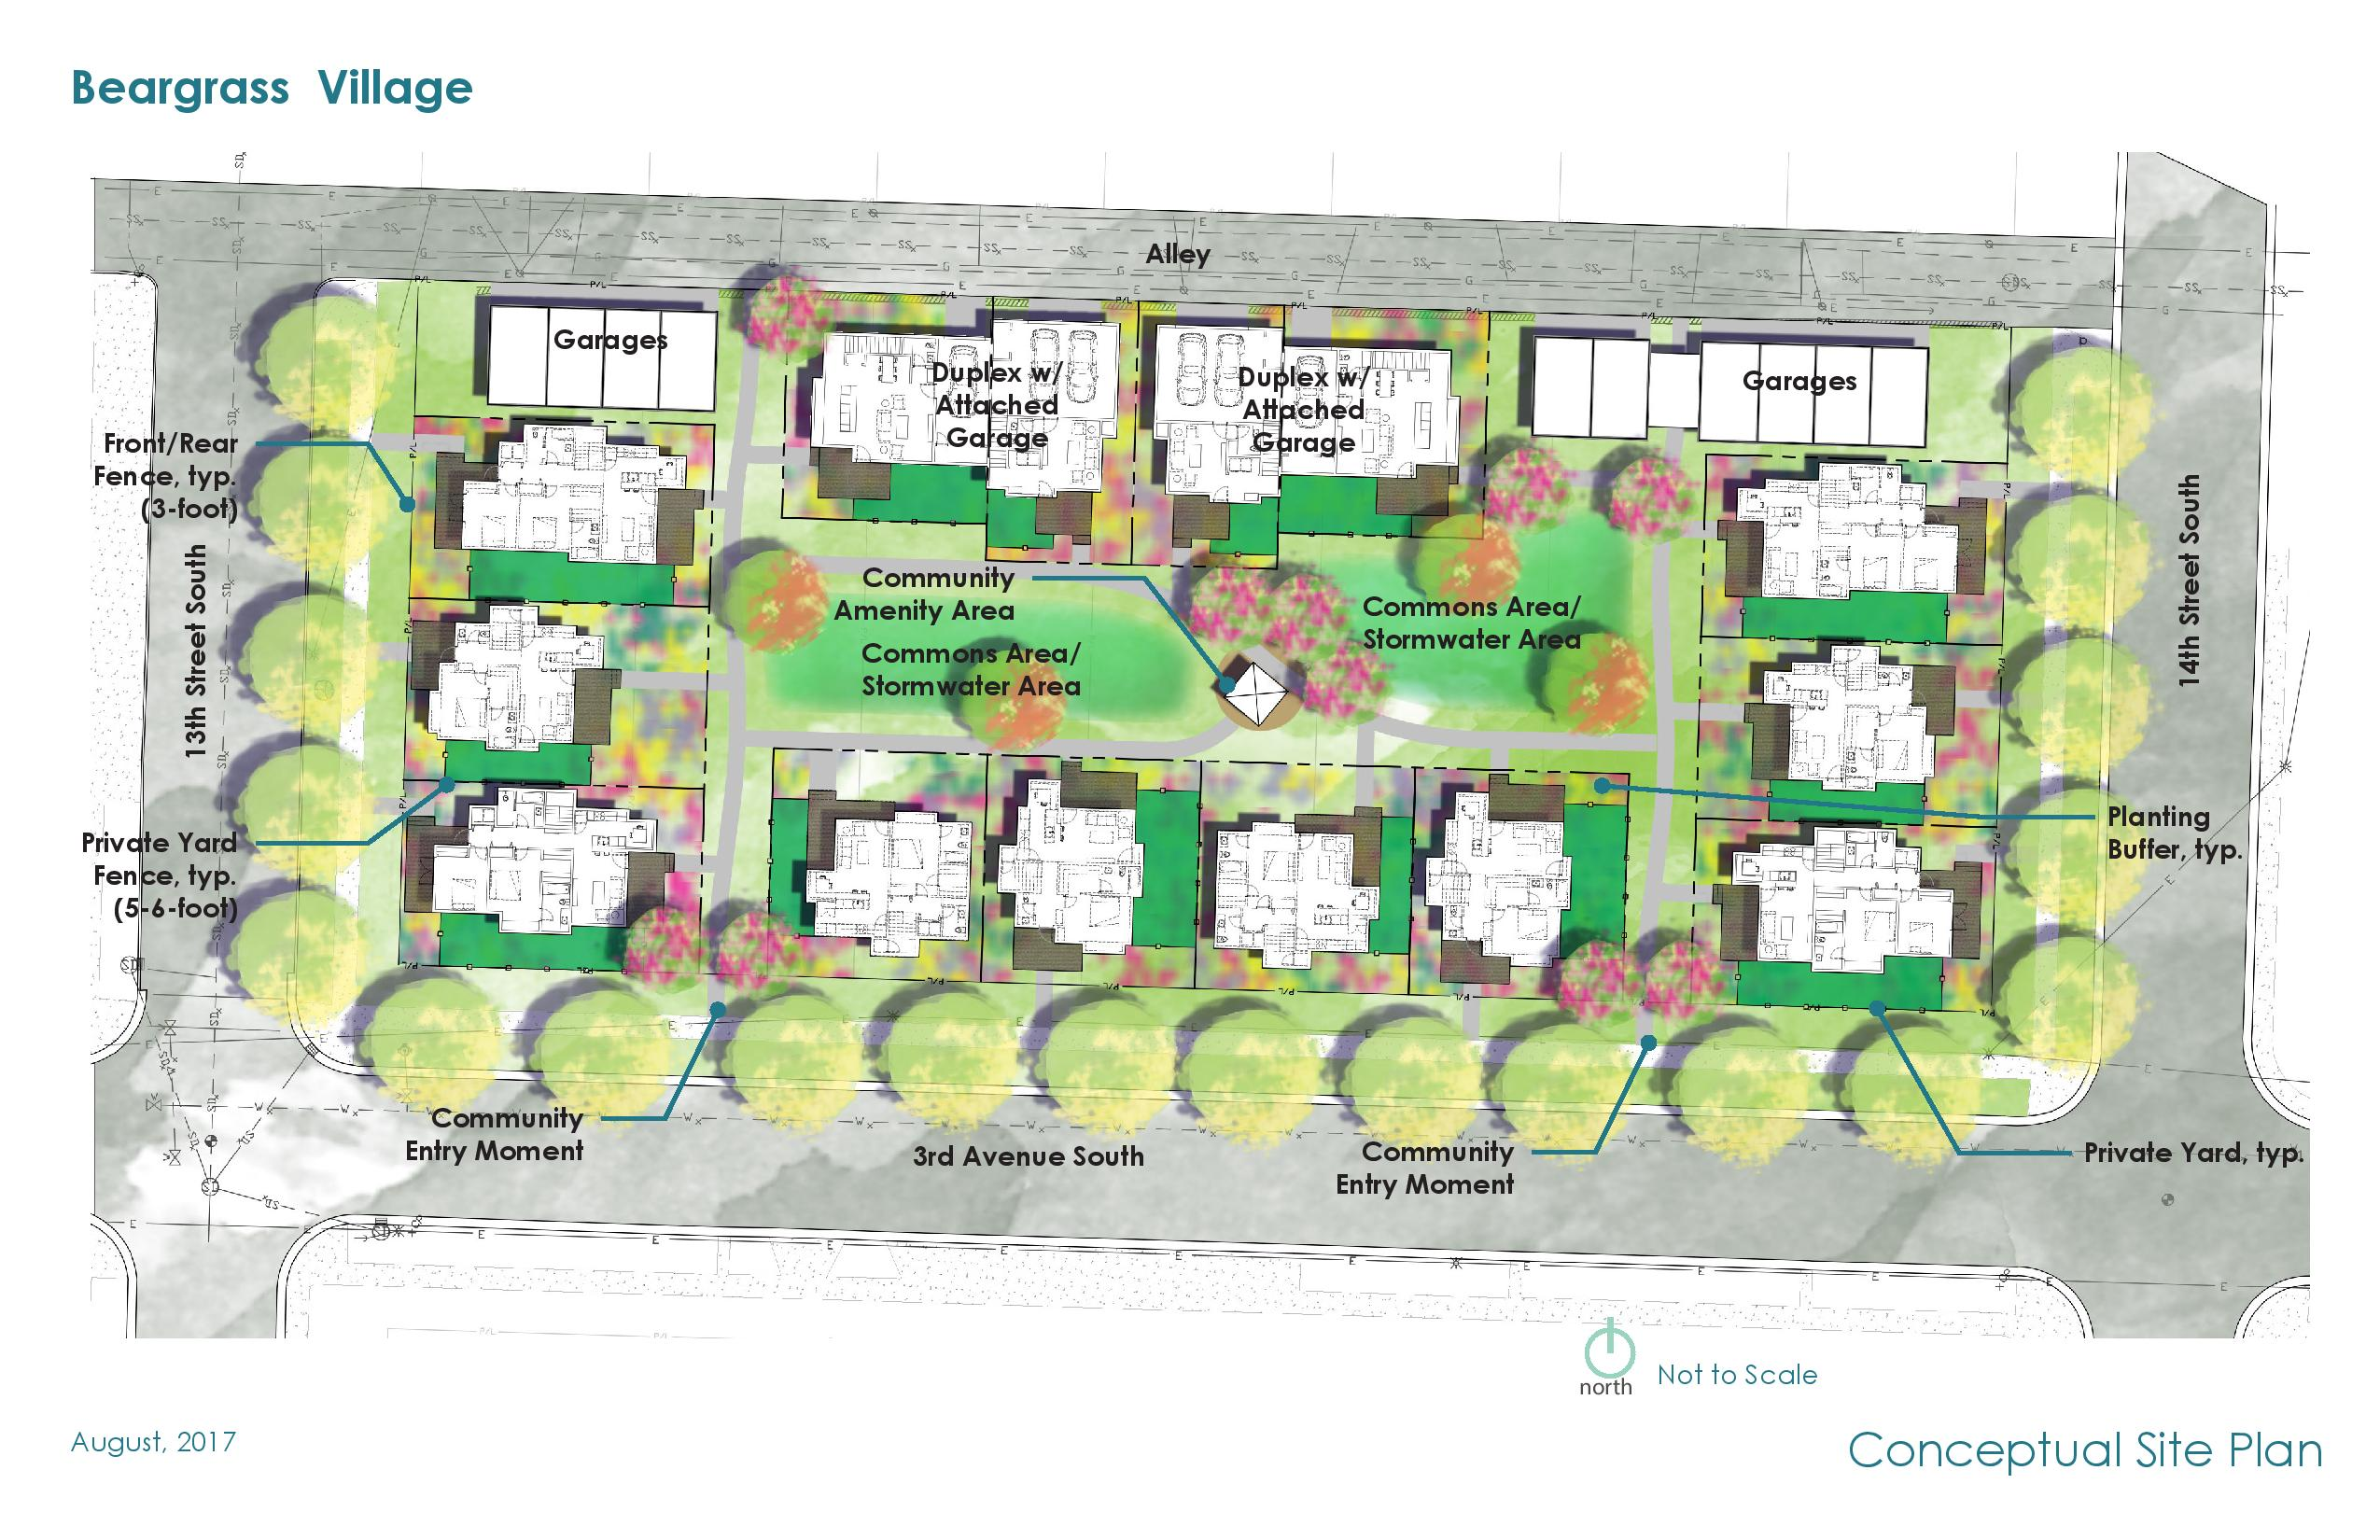 Conceptual plan for NeighborWorks Great Falls' Beargrass Village.